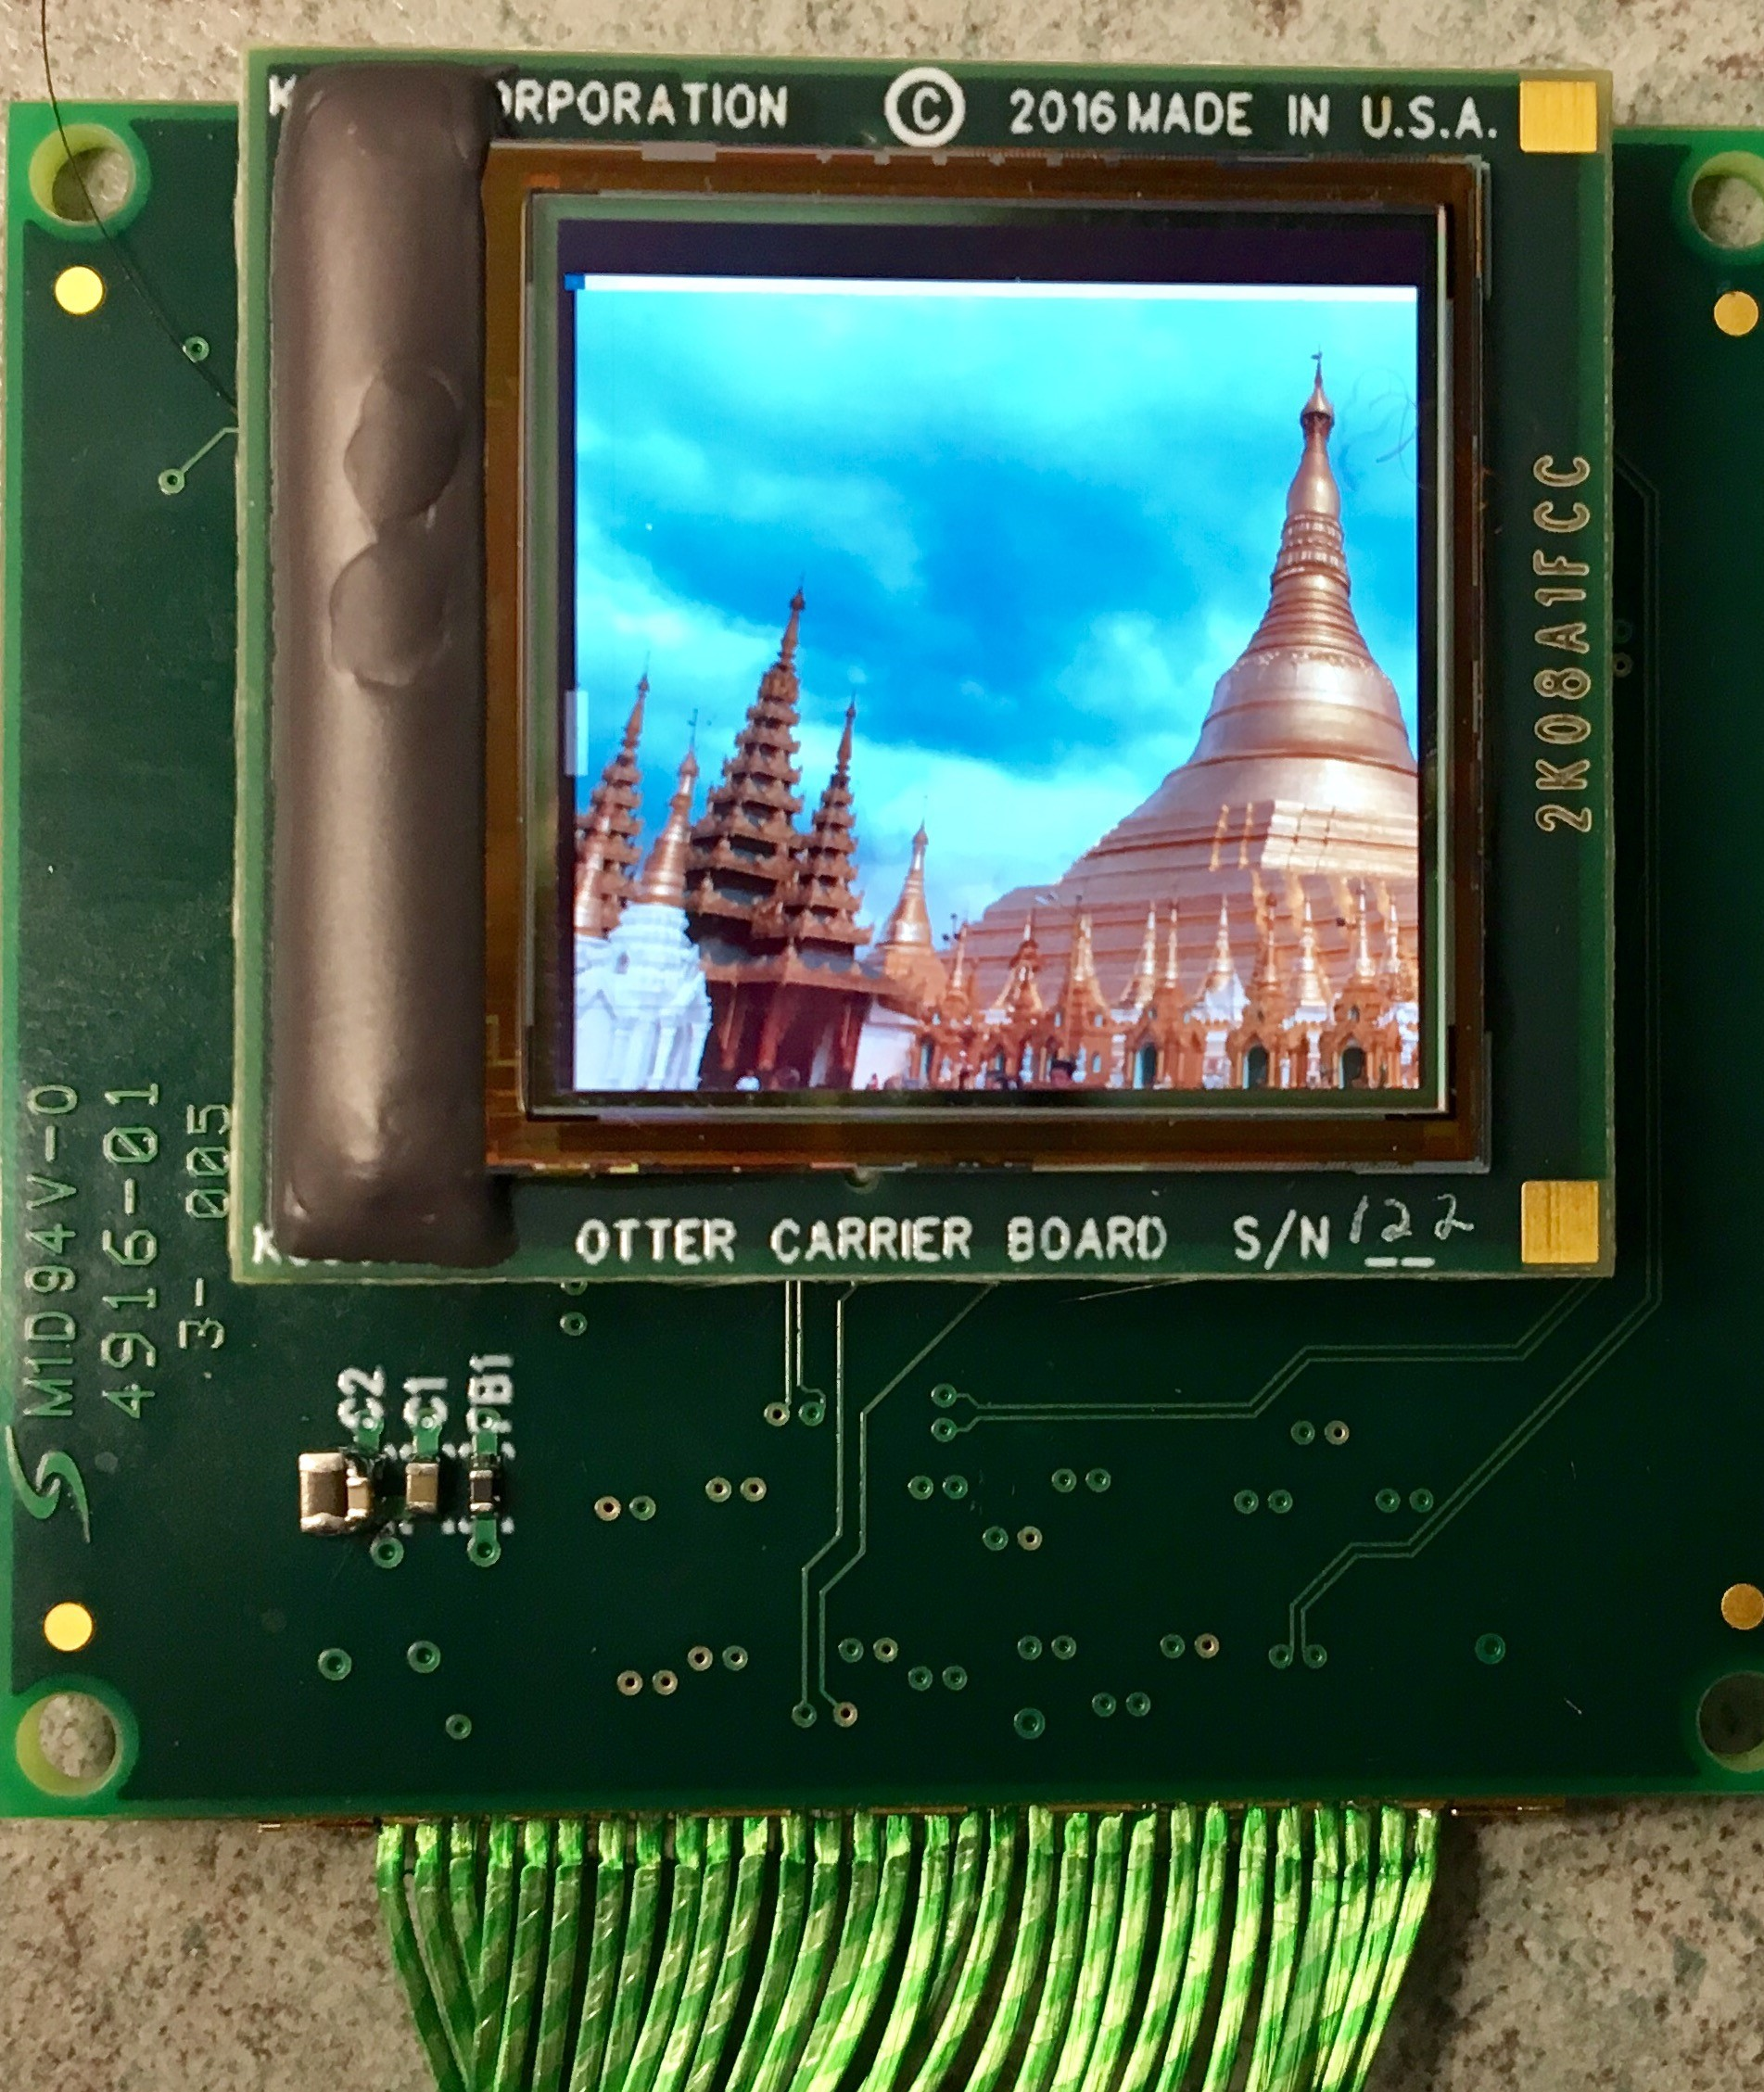 Kopin Debuts Lightning OLED Microdisplay With 2k x 2k Resolution for